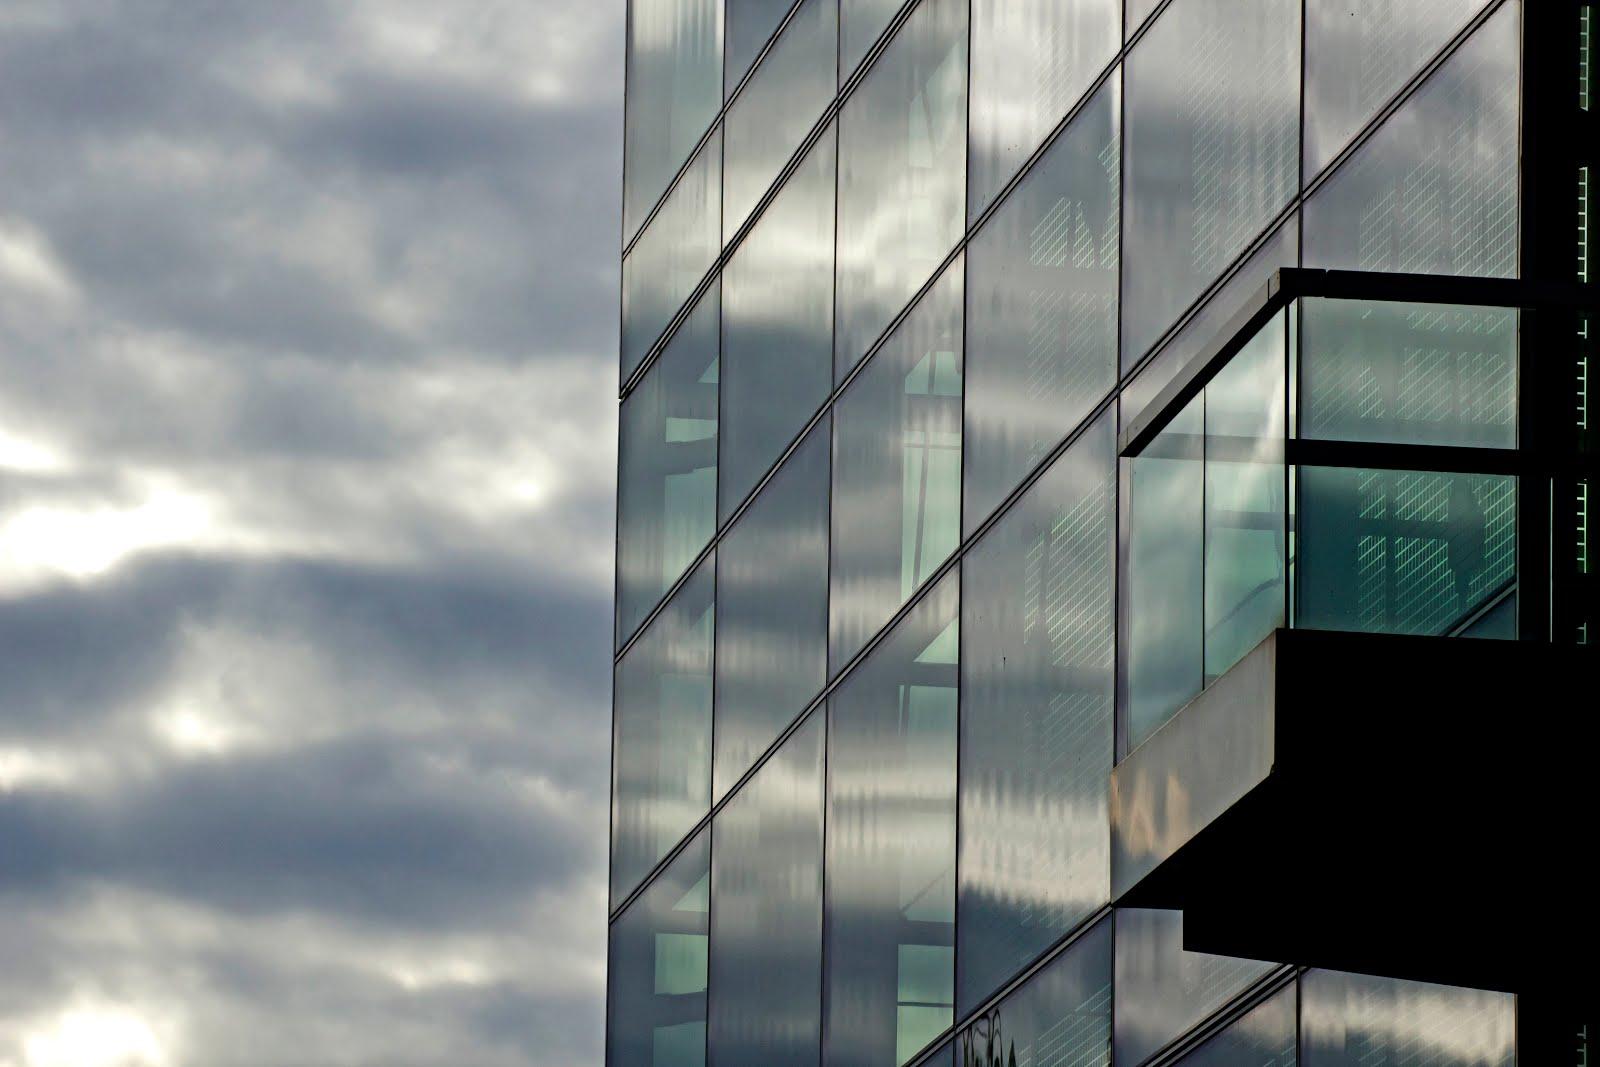 glass-building-background-1113tm-pic-279.jpg